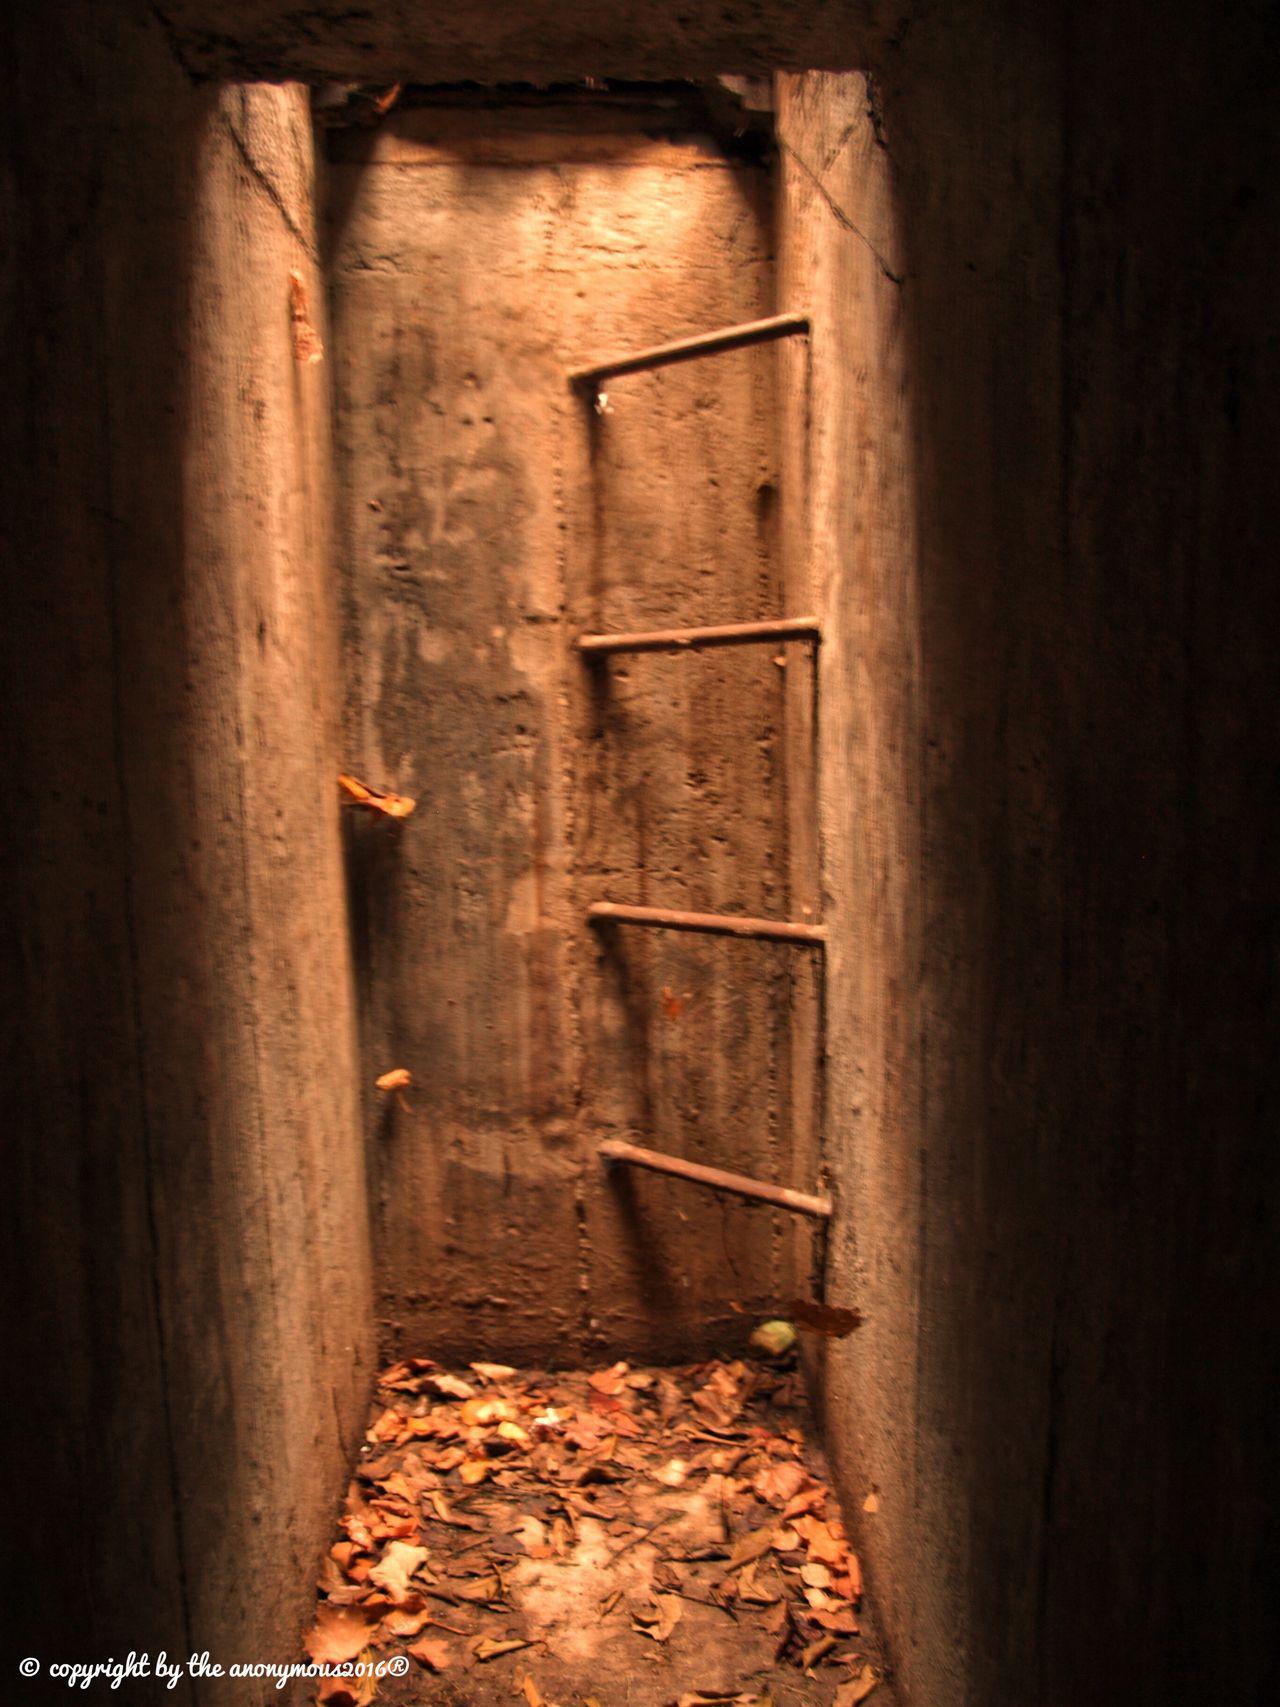 Nature Cellar Door Indoors  Abandoned No People Basement Architecture Day Outdoors EyeEmBestPics EyeEm Nature Lover EyeEm Gallery EyeEm Best Shots EyeEm Best Edits Eye4photography  Beauty In Nature Capture The Moment